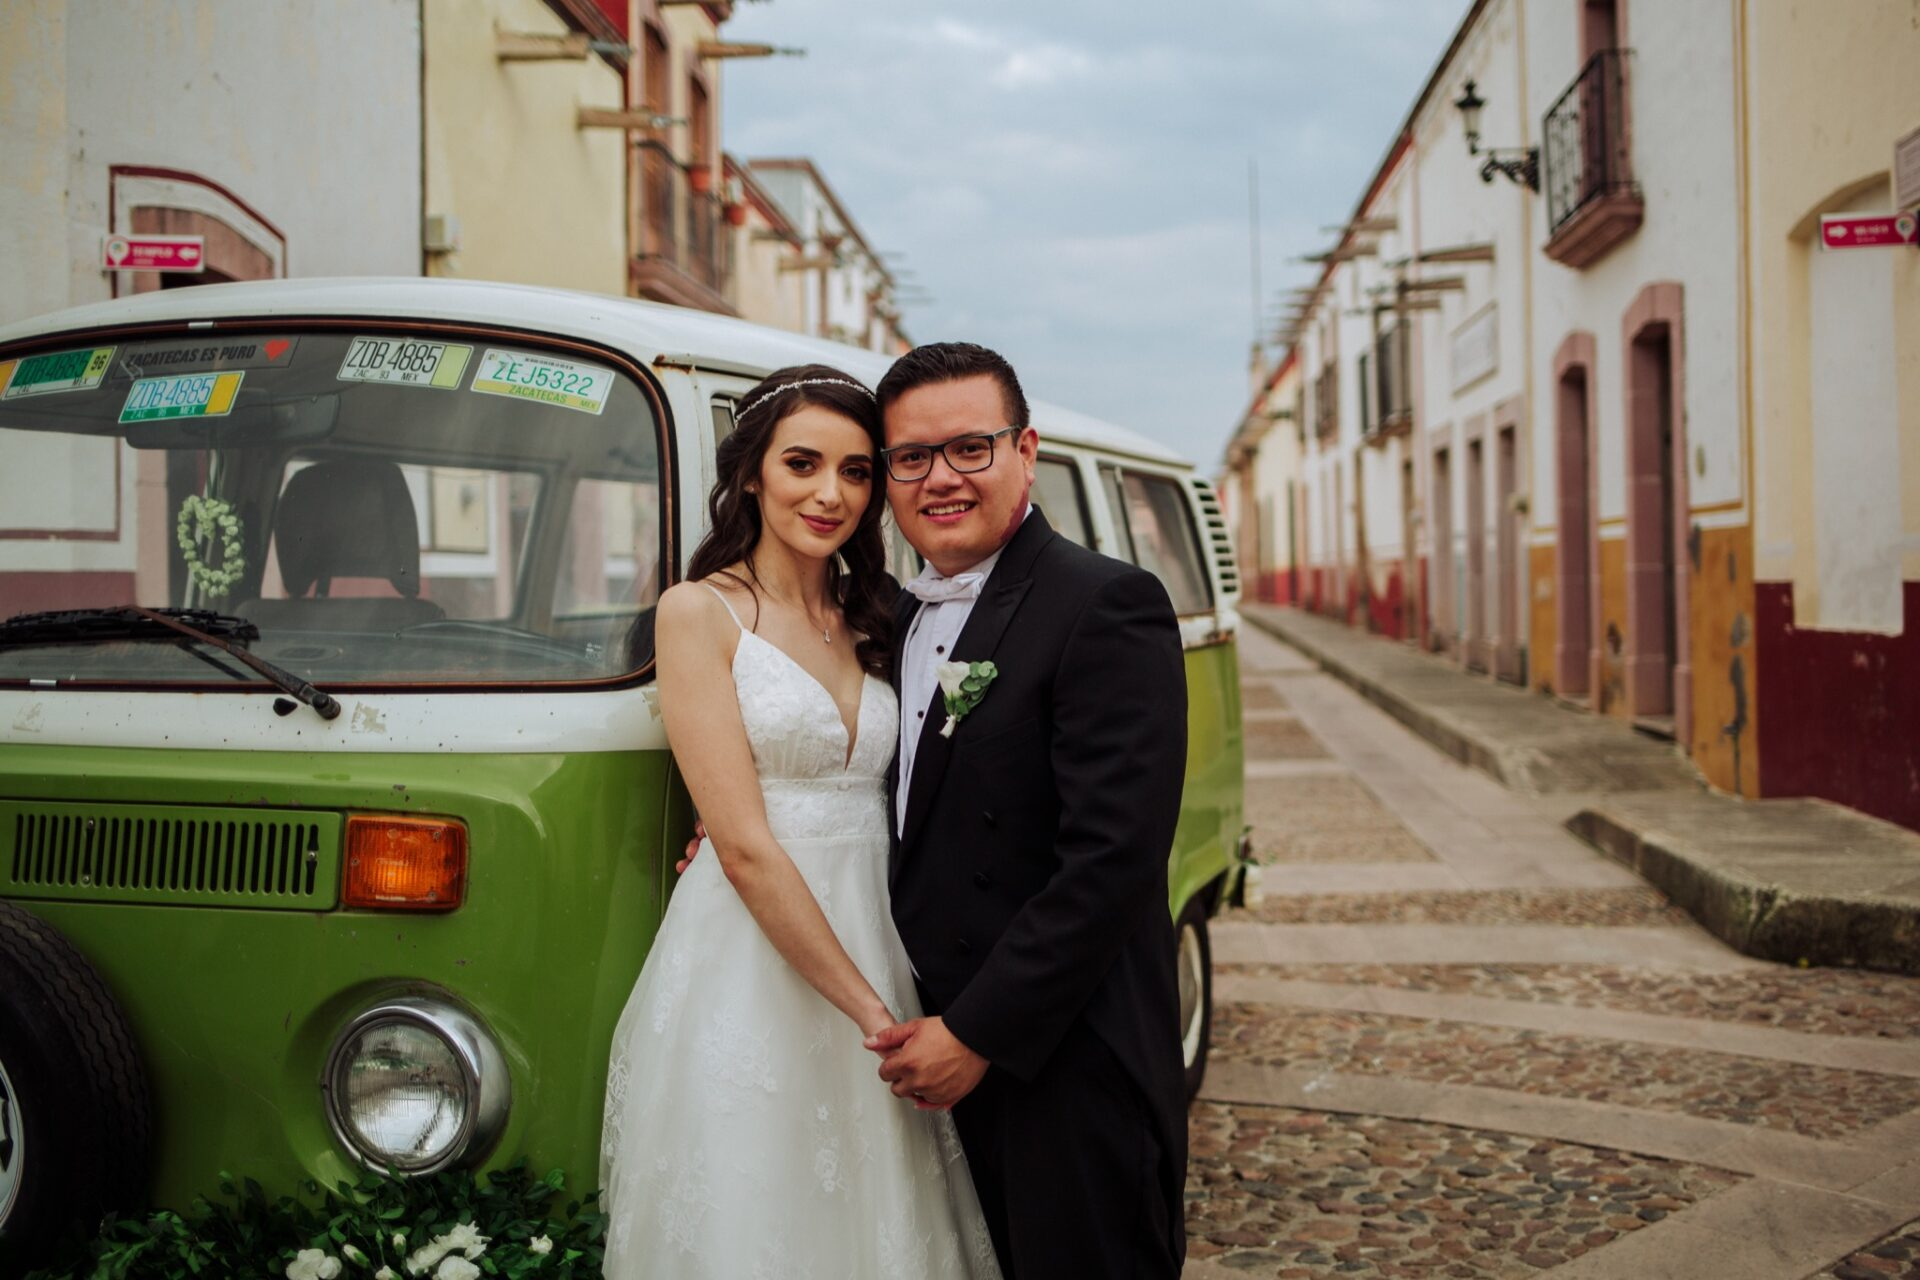 javier_noriega_fotografo_bodas_teul_zacatecas_wedding_photographer23a